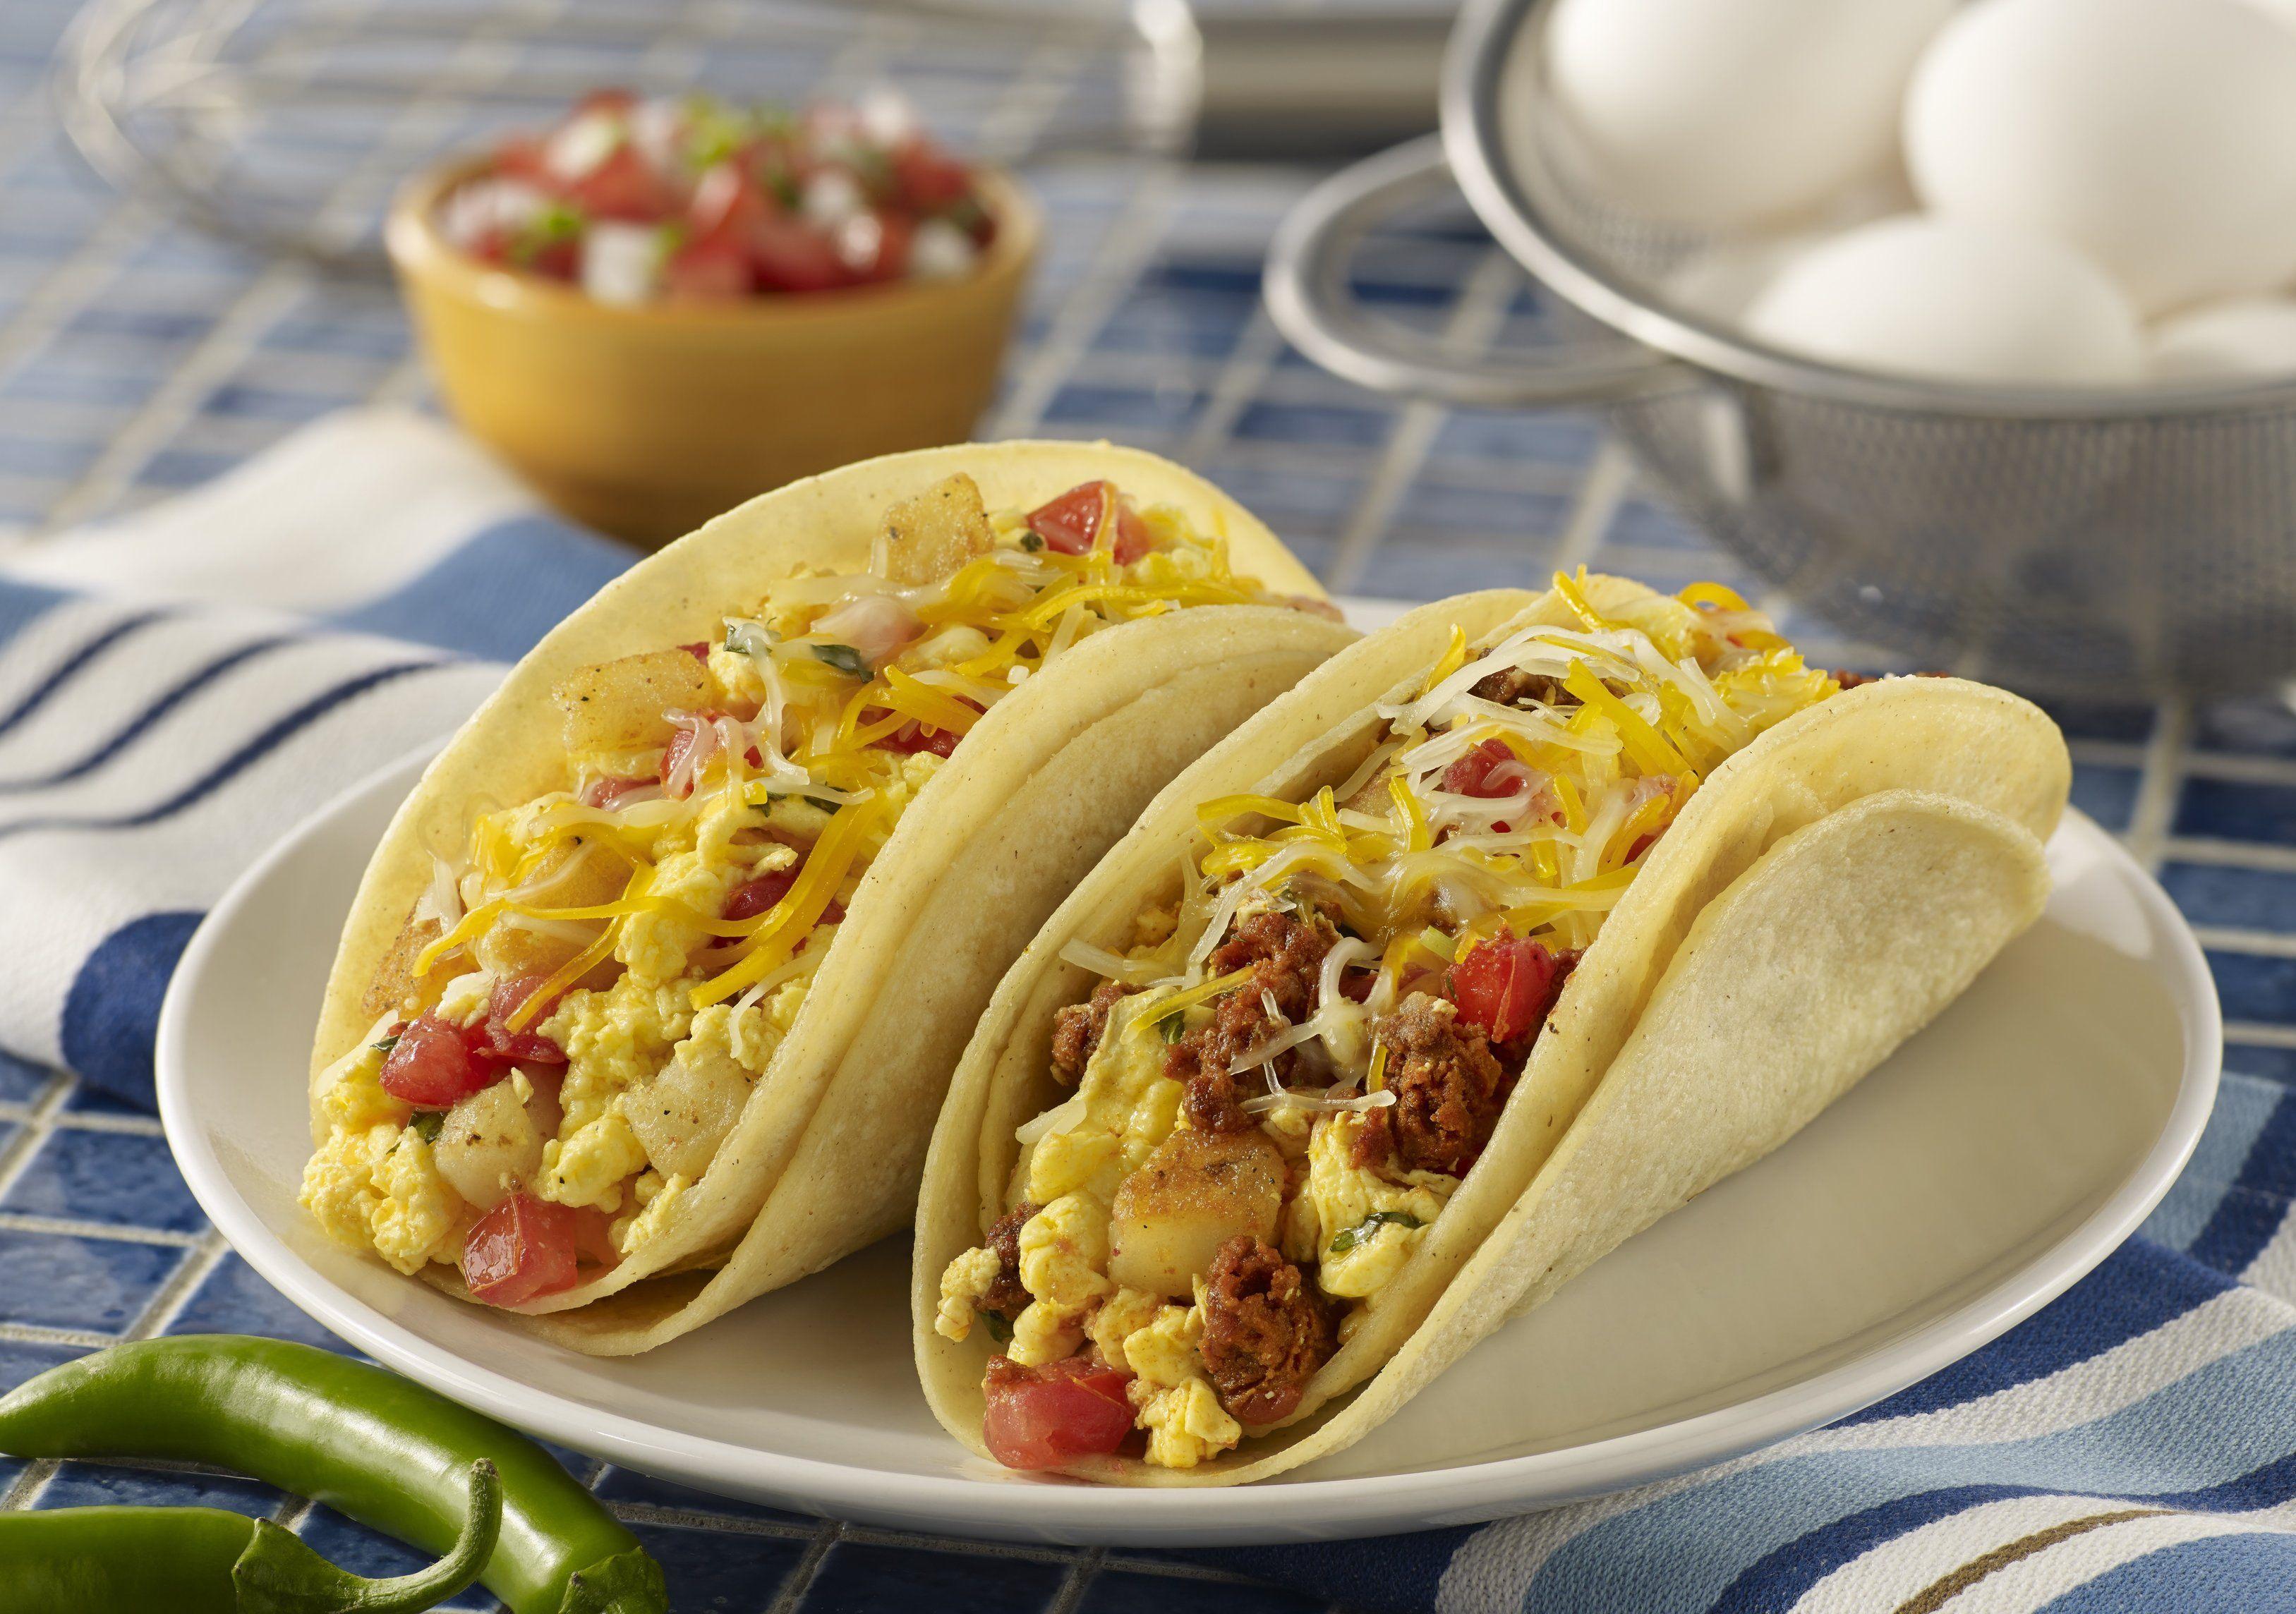 Chronic tacos breakfast taco recipes featured in oc mom